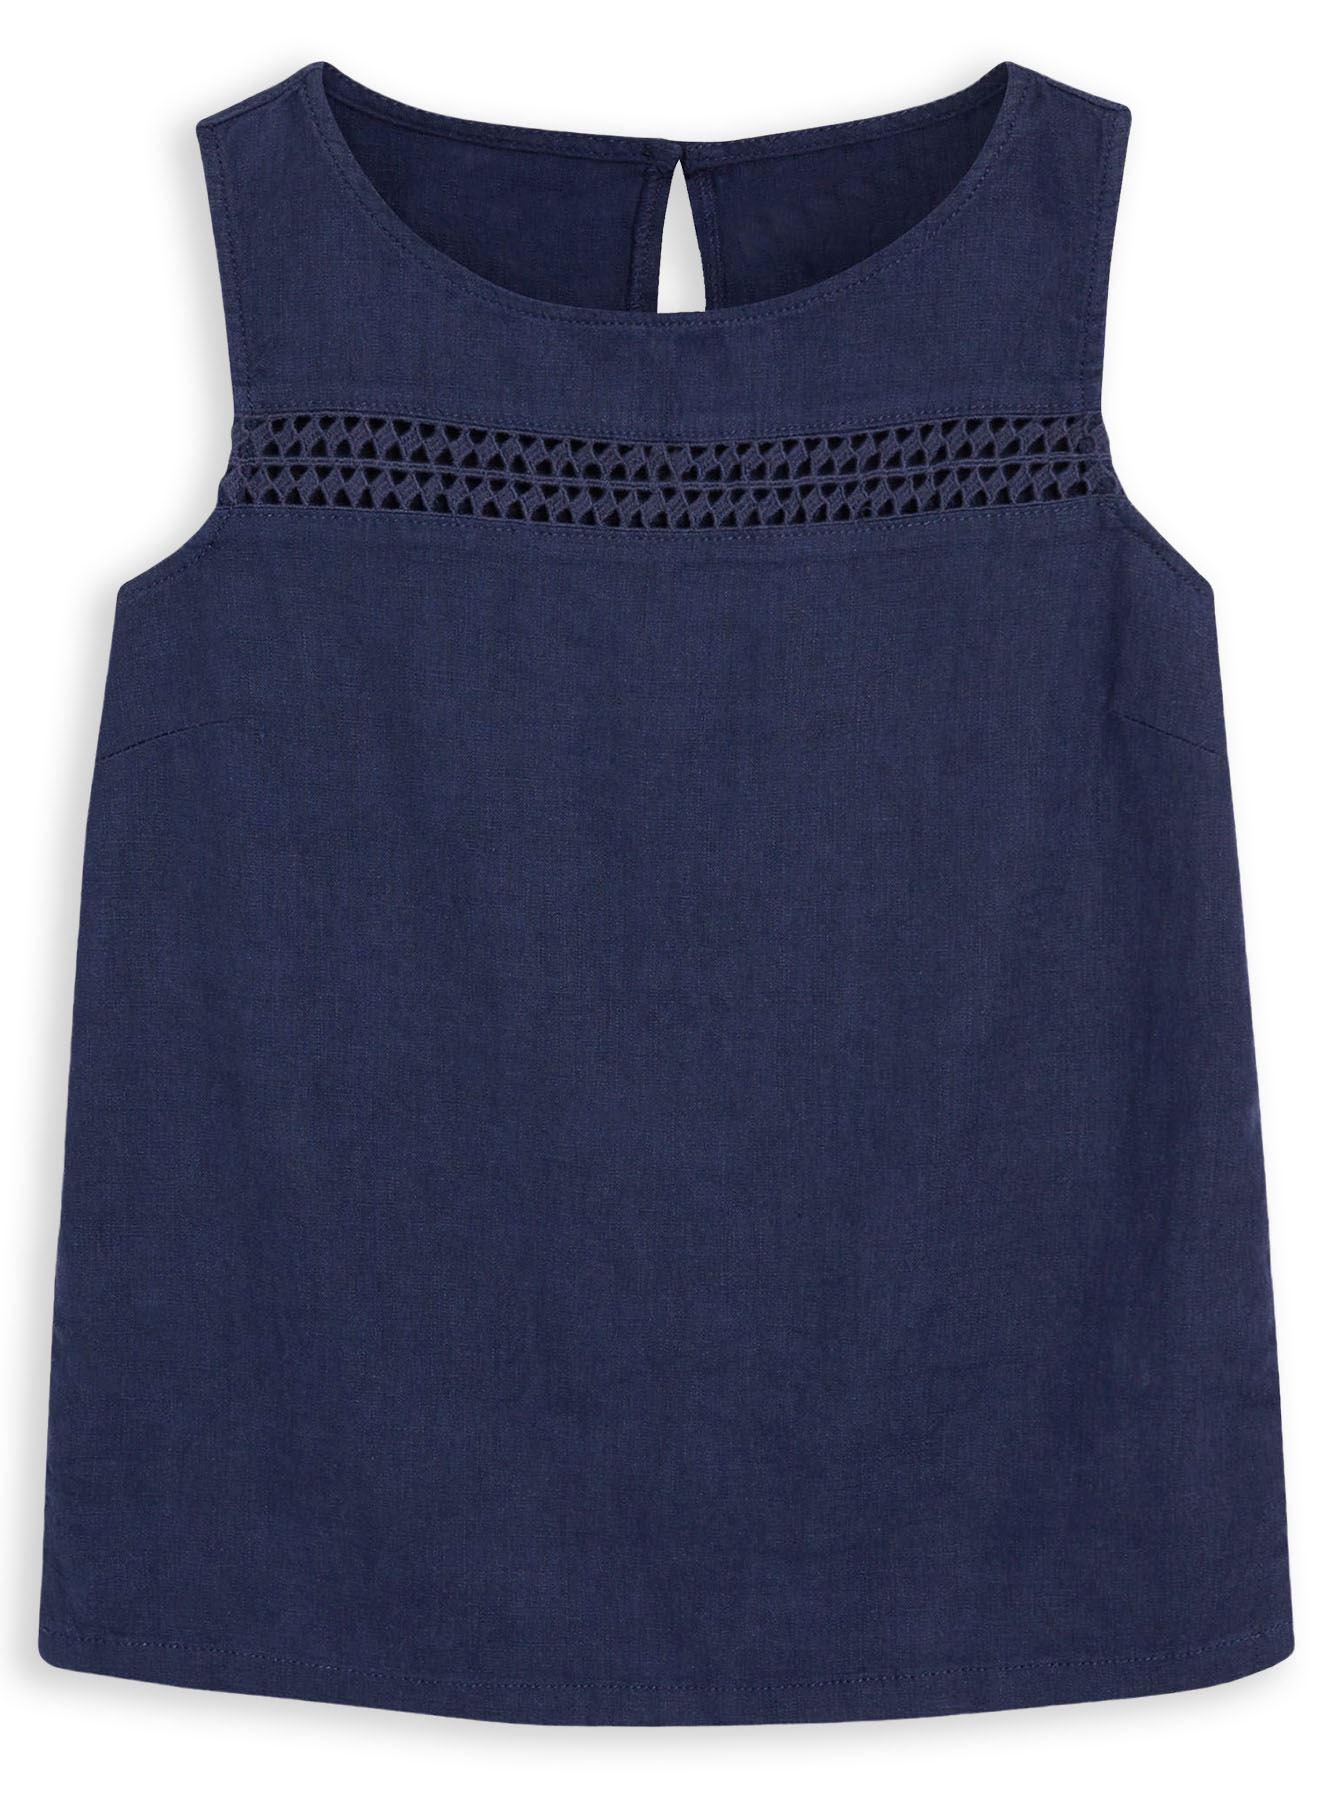 New ex Next Ladies Linen Sleeveless Boxy Summer Vest Top Size 8 Yellow Ochre